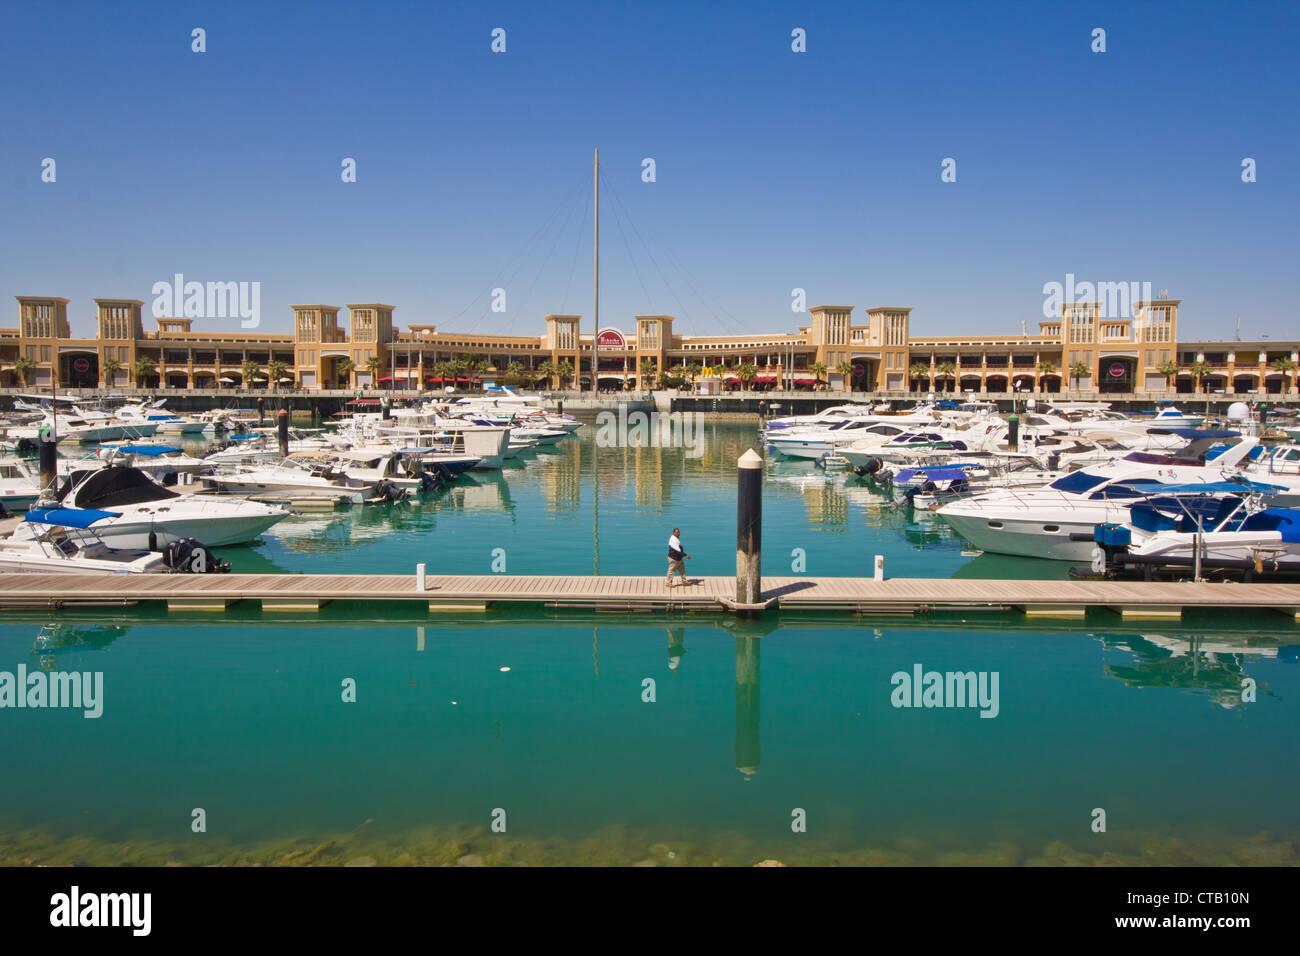 arabia architecture islamic  kuwait gulf arabian marina yacht - Stock Image